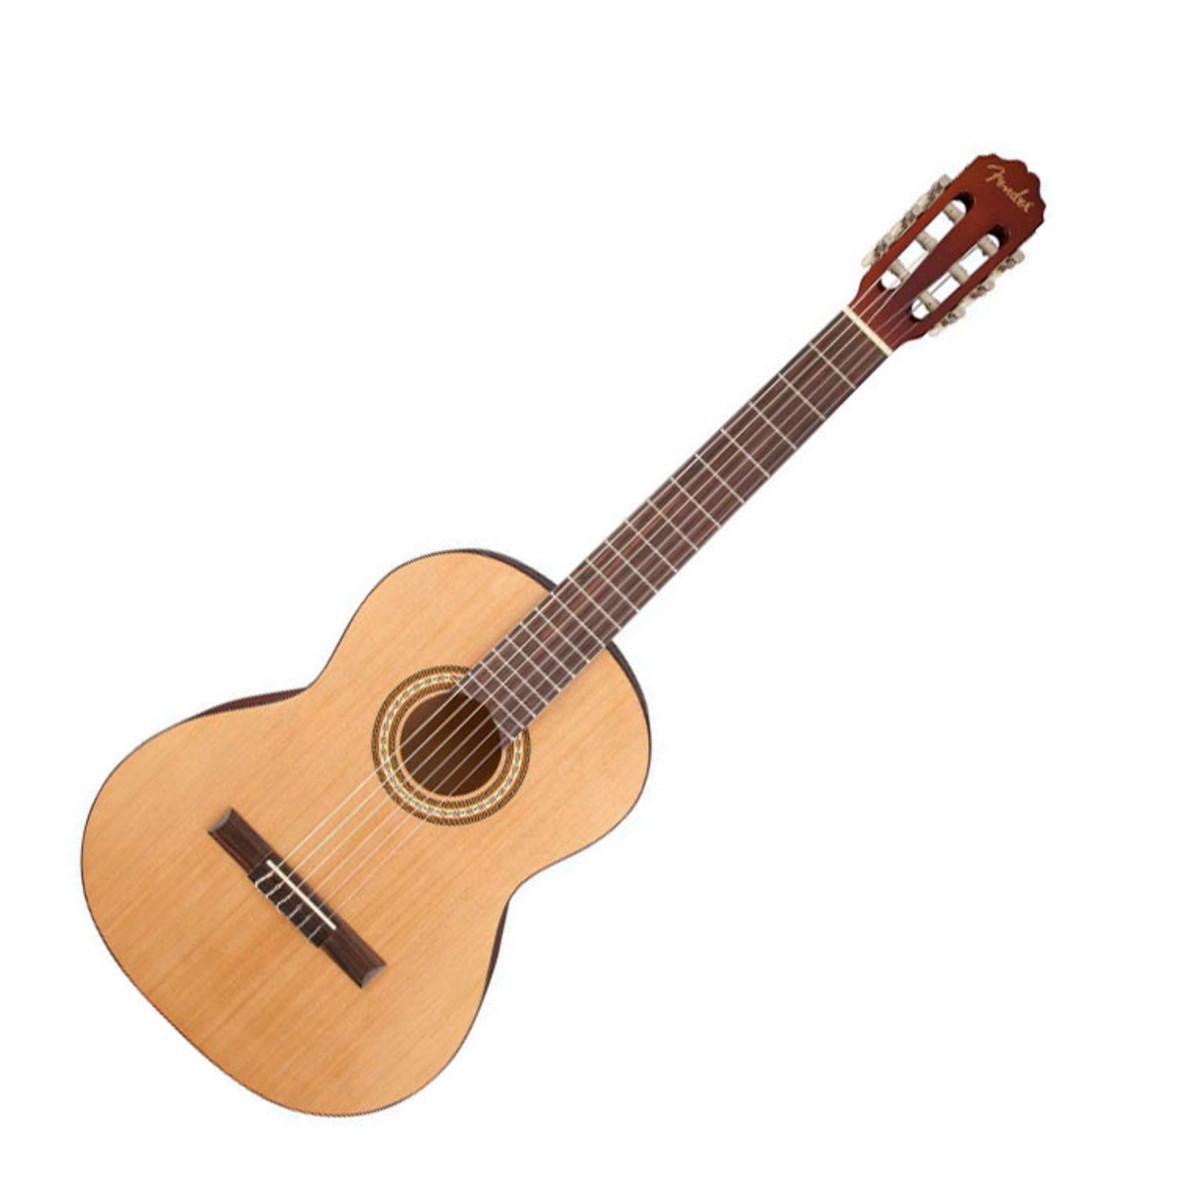 fender fc 1 guitare classique naturel. Black Bedroom Furniture Sets. Home Design Ideas